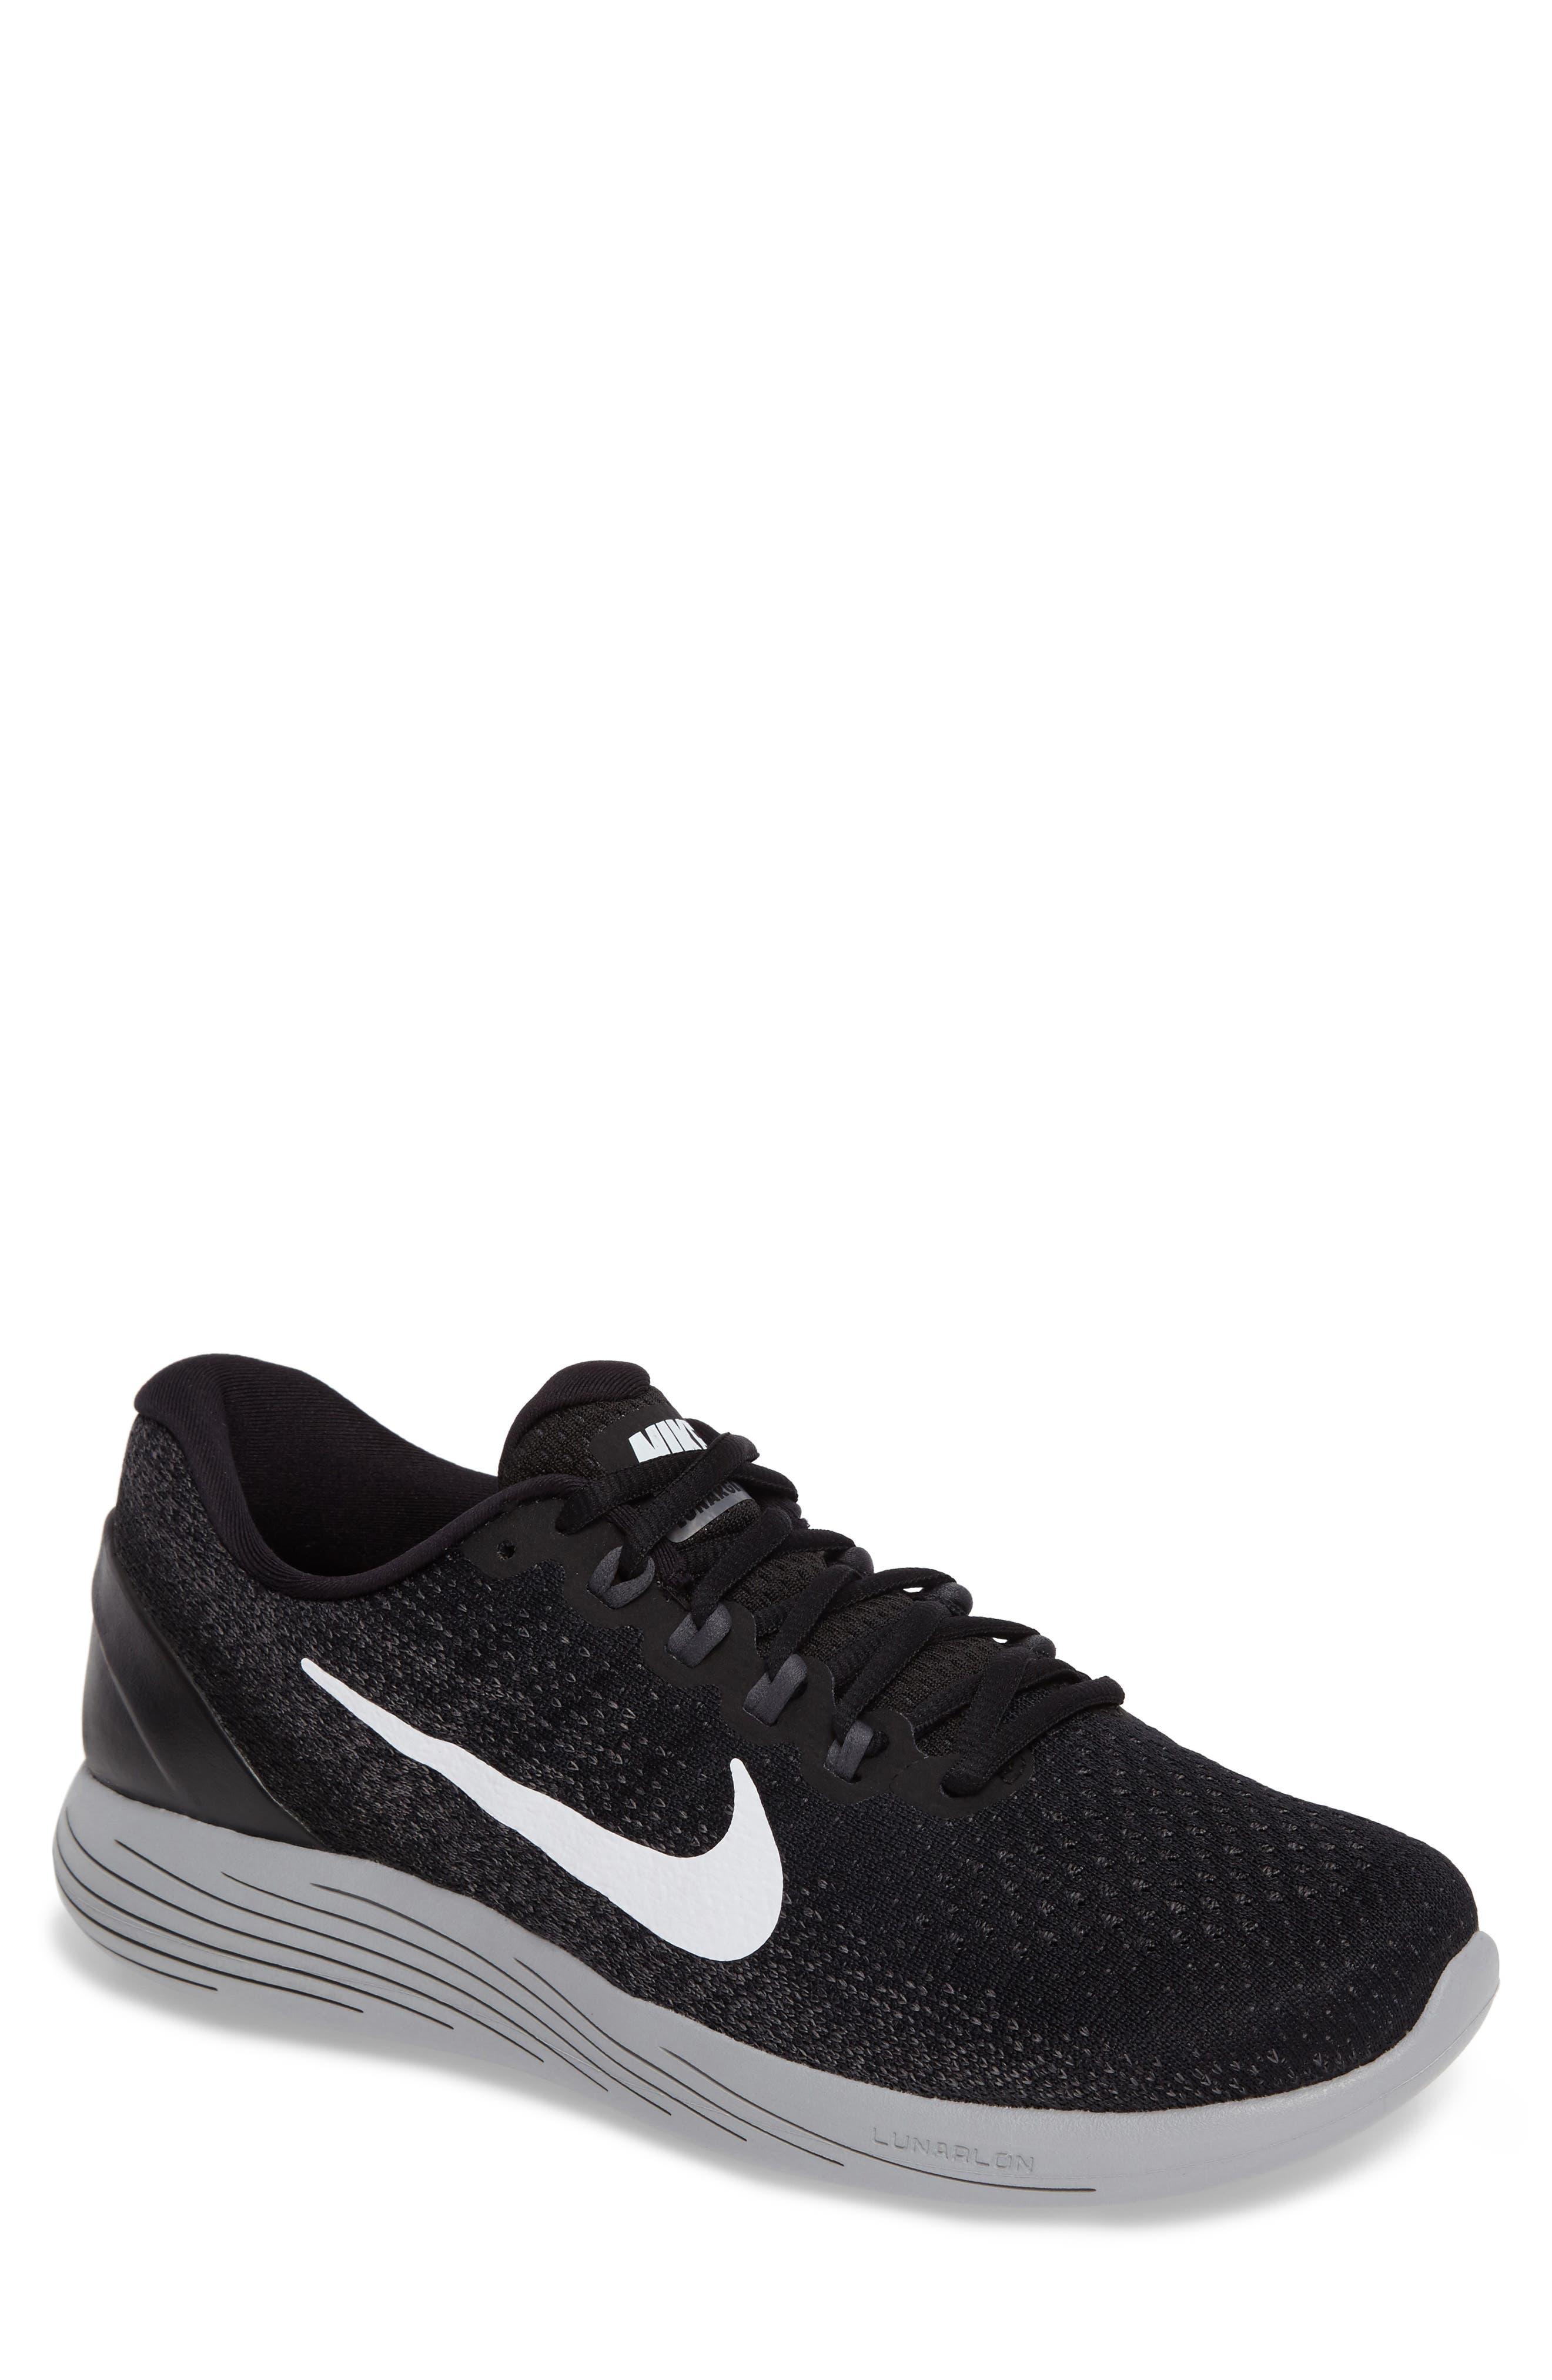 Nike LunarGlide 9 Running Shoe (Men)